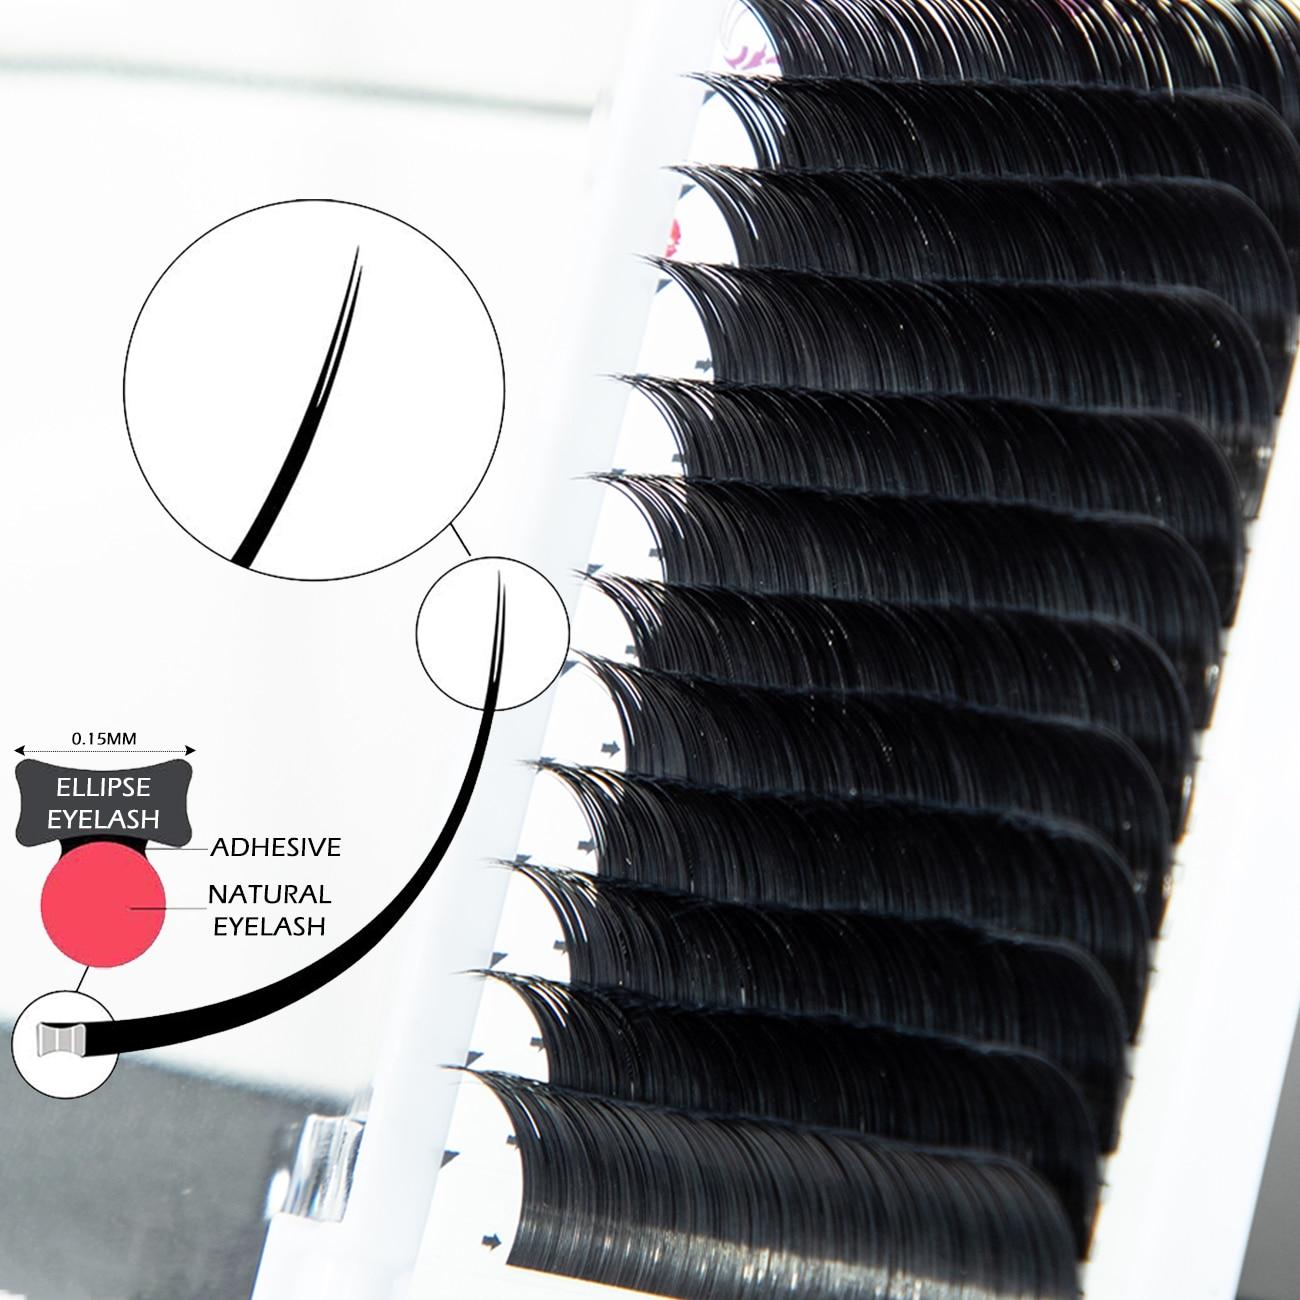 2019 New Matte Flat Eyelash Extensions Individual Mink 0.15 0.20 0.25 Softer Ellipse Flat Lash Split Tips Ligher Volume Looking